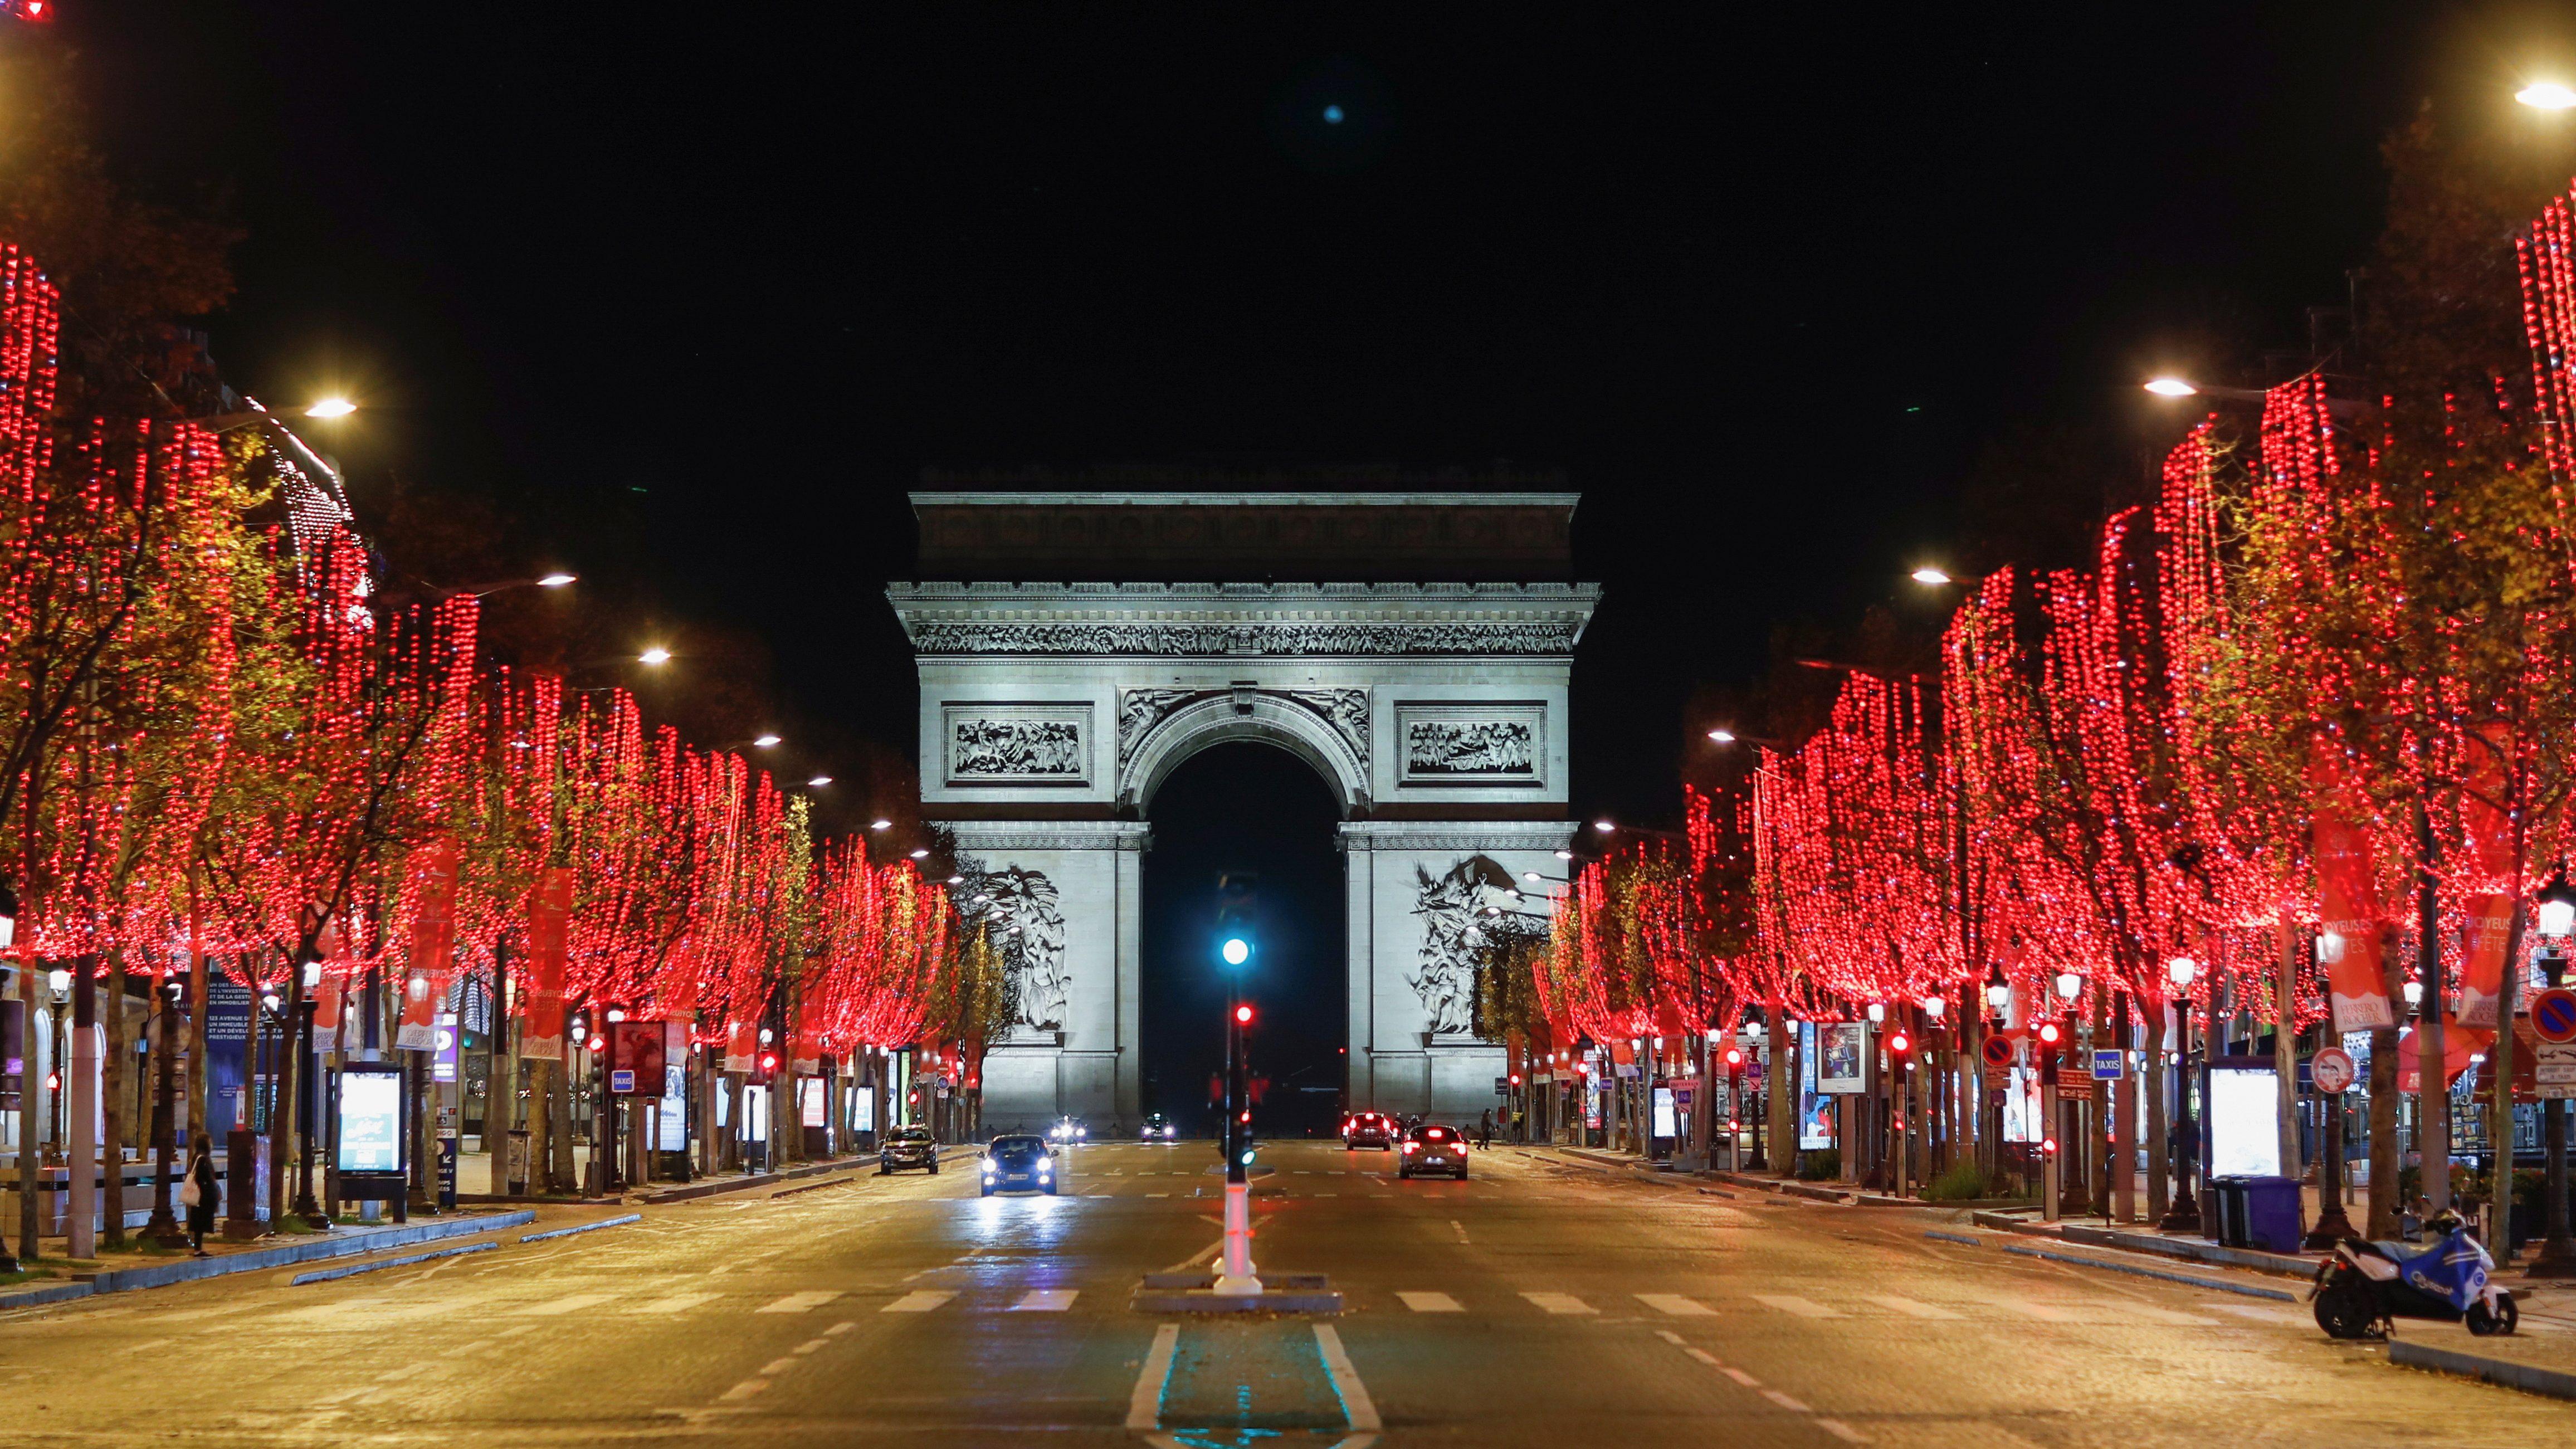 France reinstates COVID-19 curfew, despite easing of COVID lockdown